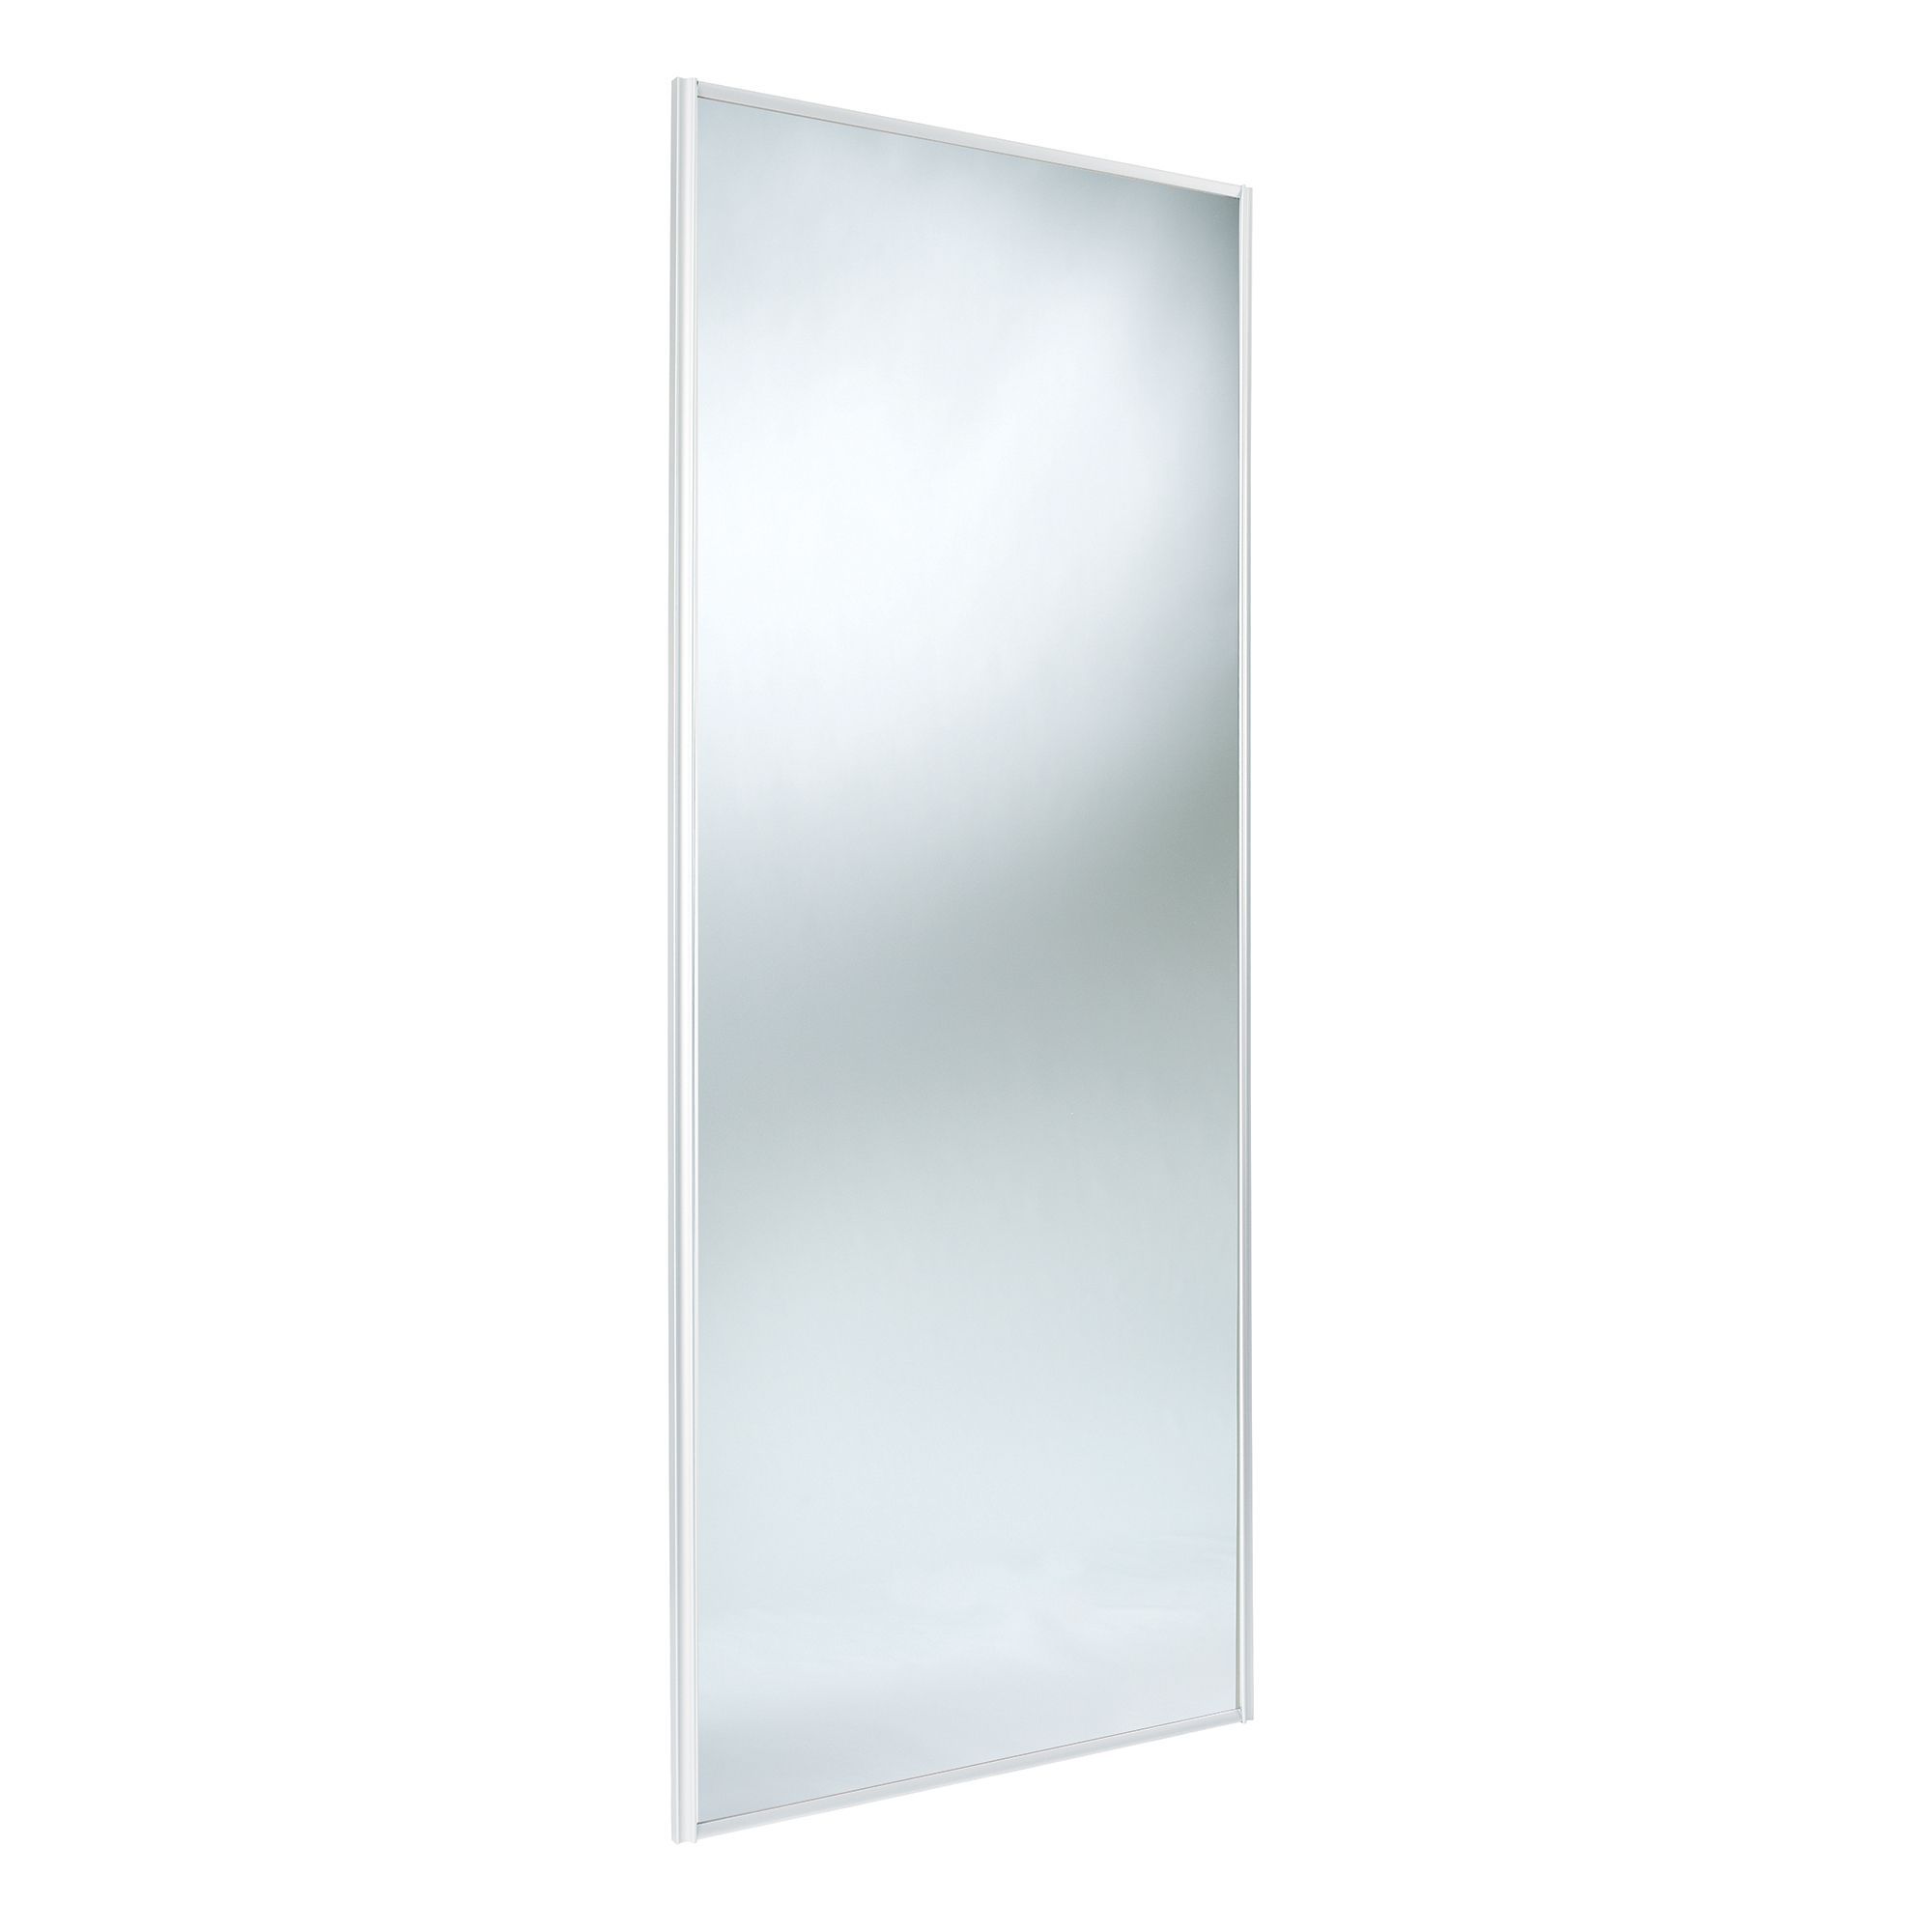 Classic Full Length Mirror White Mirror Effect Sliding Wardrobe Door (h)2220 Mm (w)914 Mm